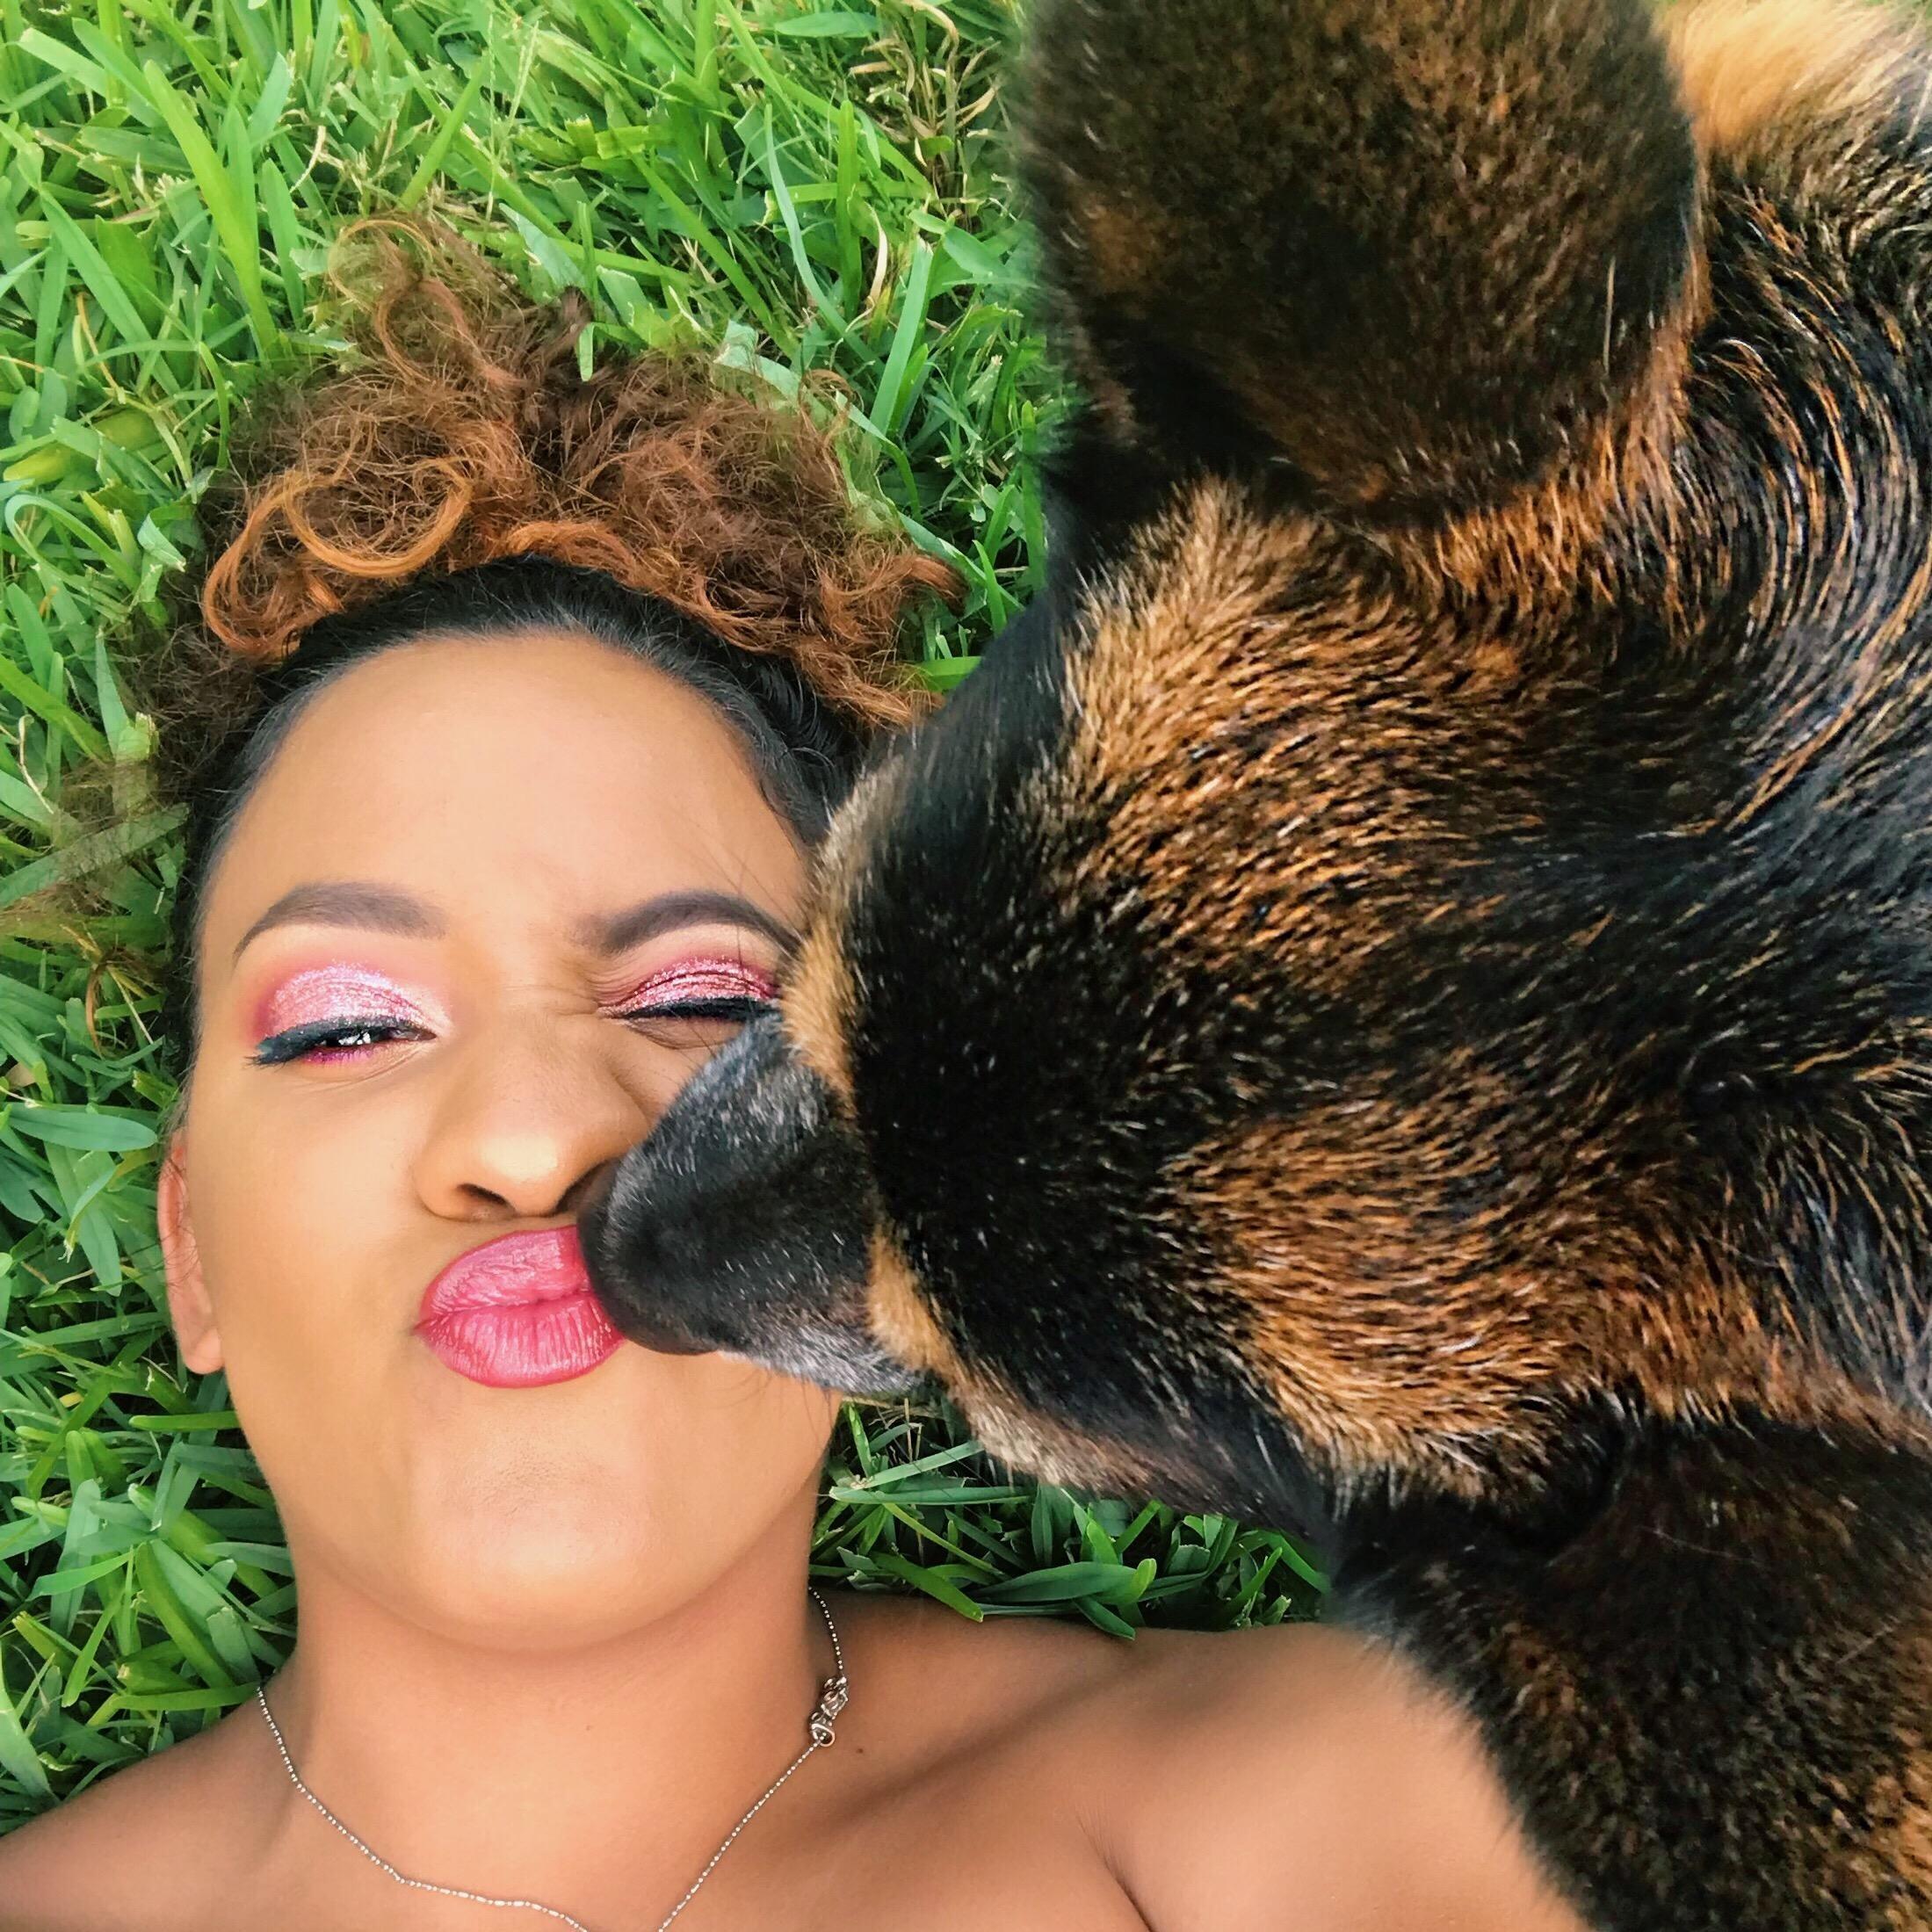 Aleesha's dog day care